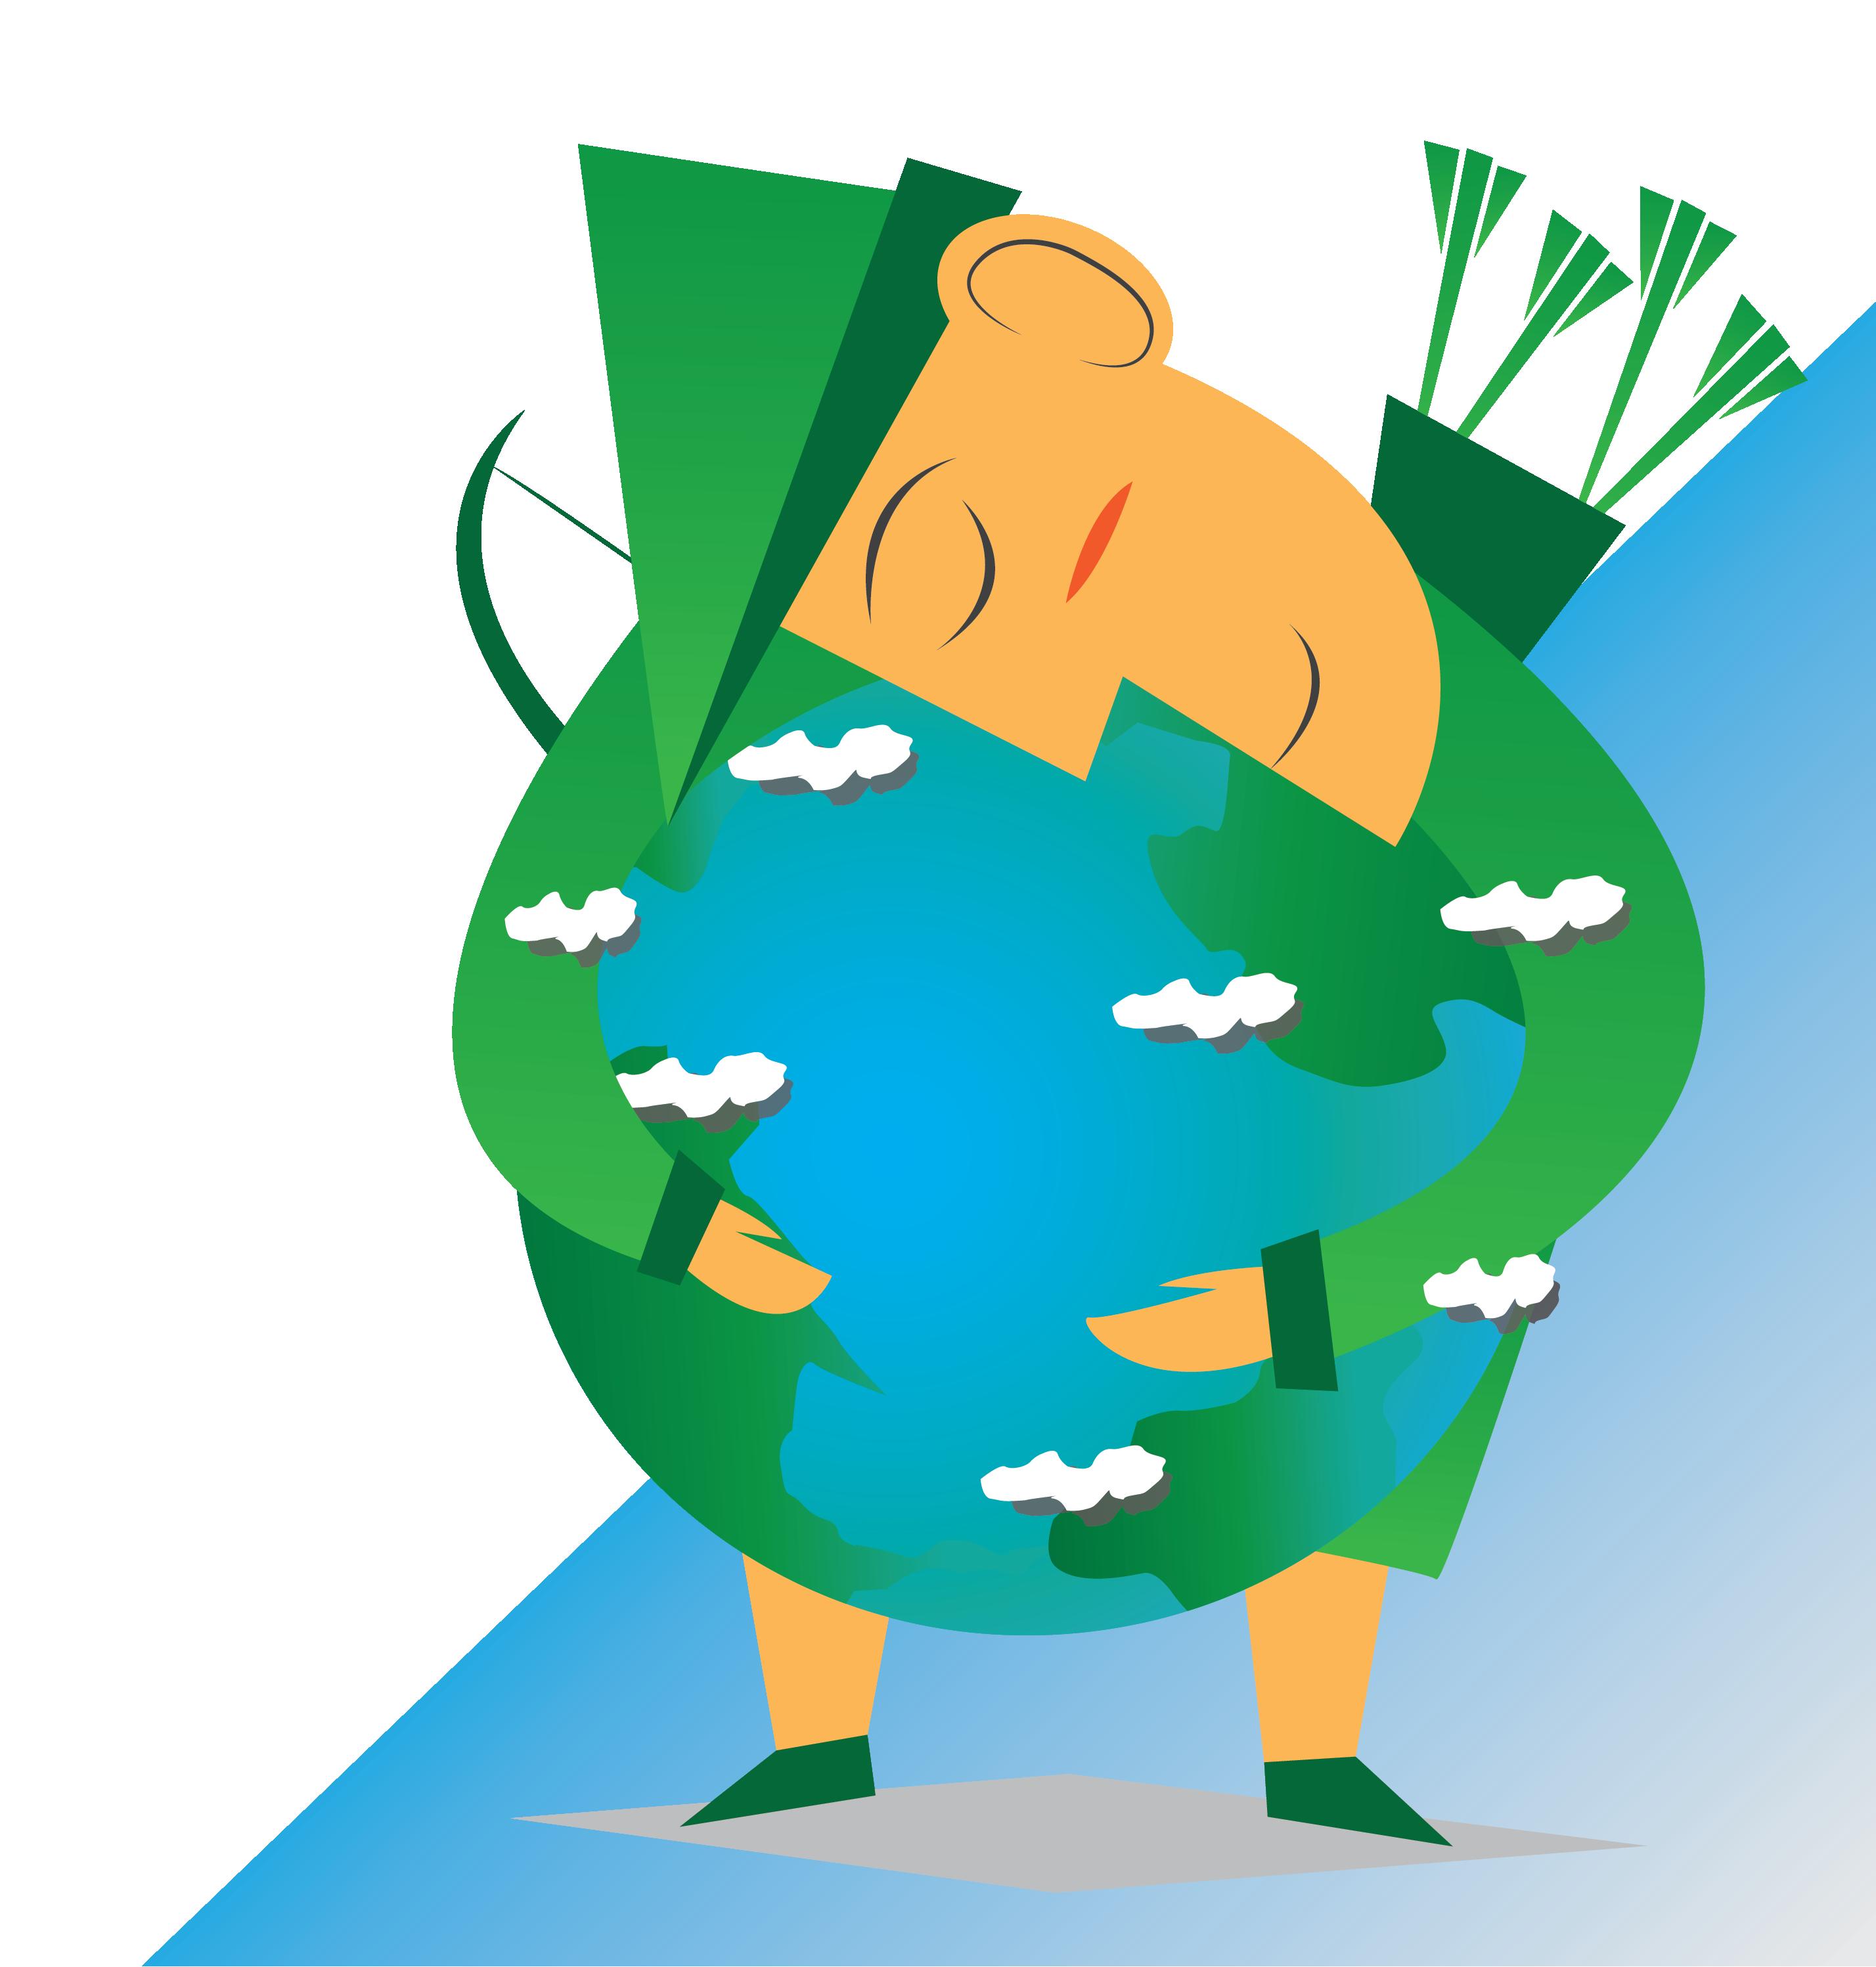 Dlsu no impact experiment. Environment clipart environmental awareness